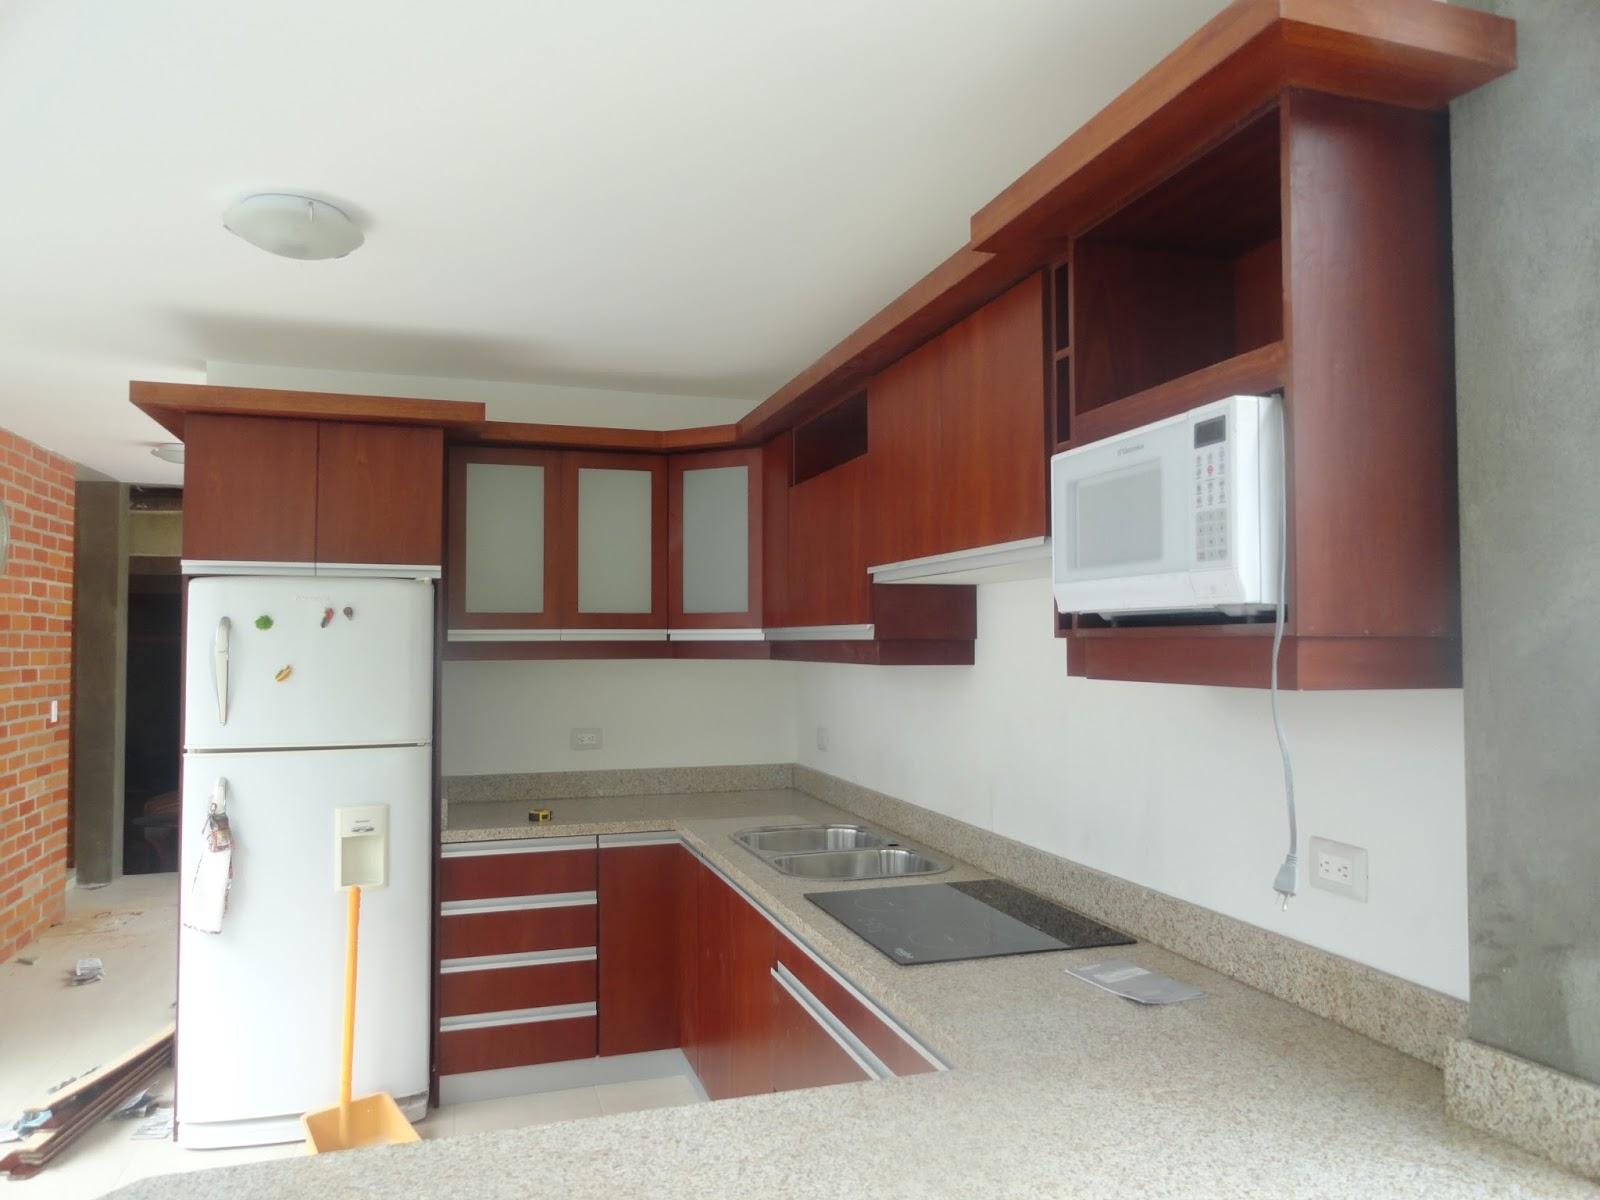 Ideatumobiliario muebles de cocina for Anaqueles de cocina modernos